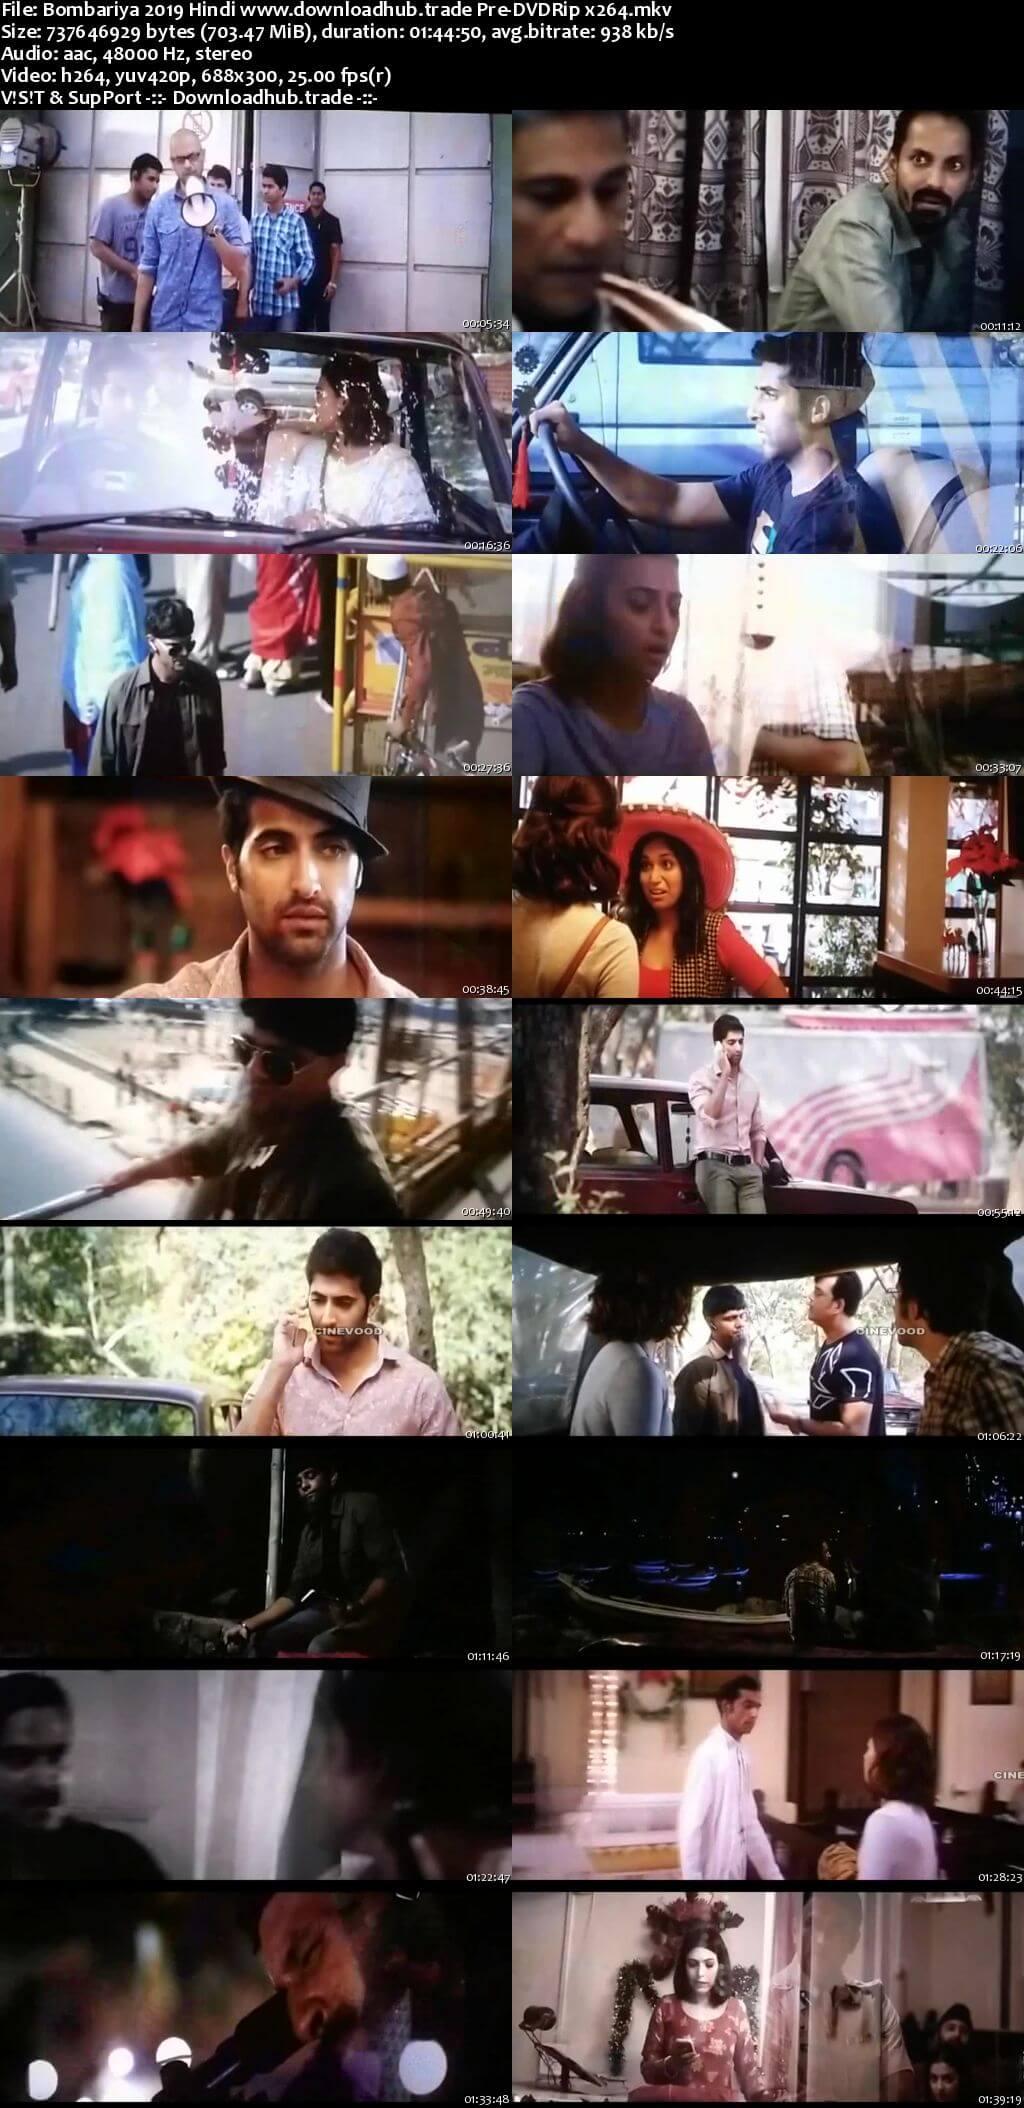 Bombariya 2019 Hindi 700MB Pre-DVDRip x264